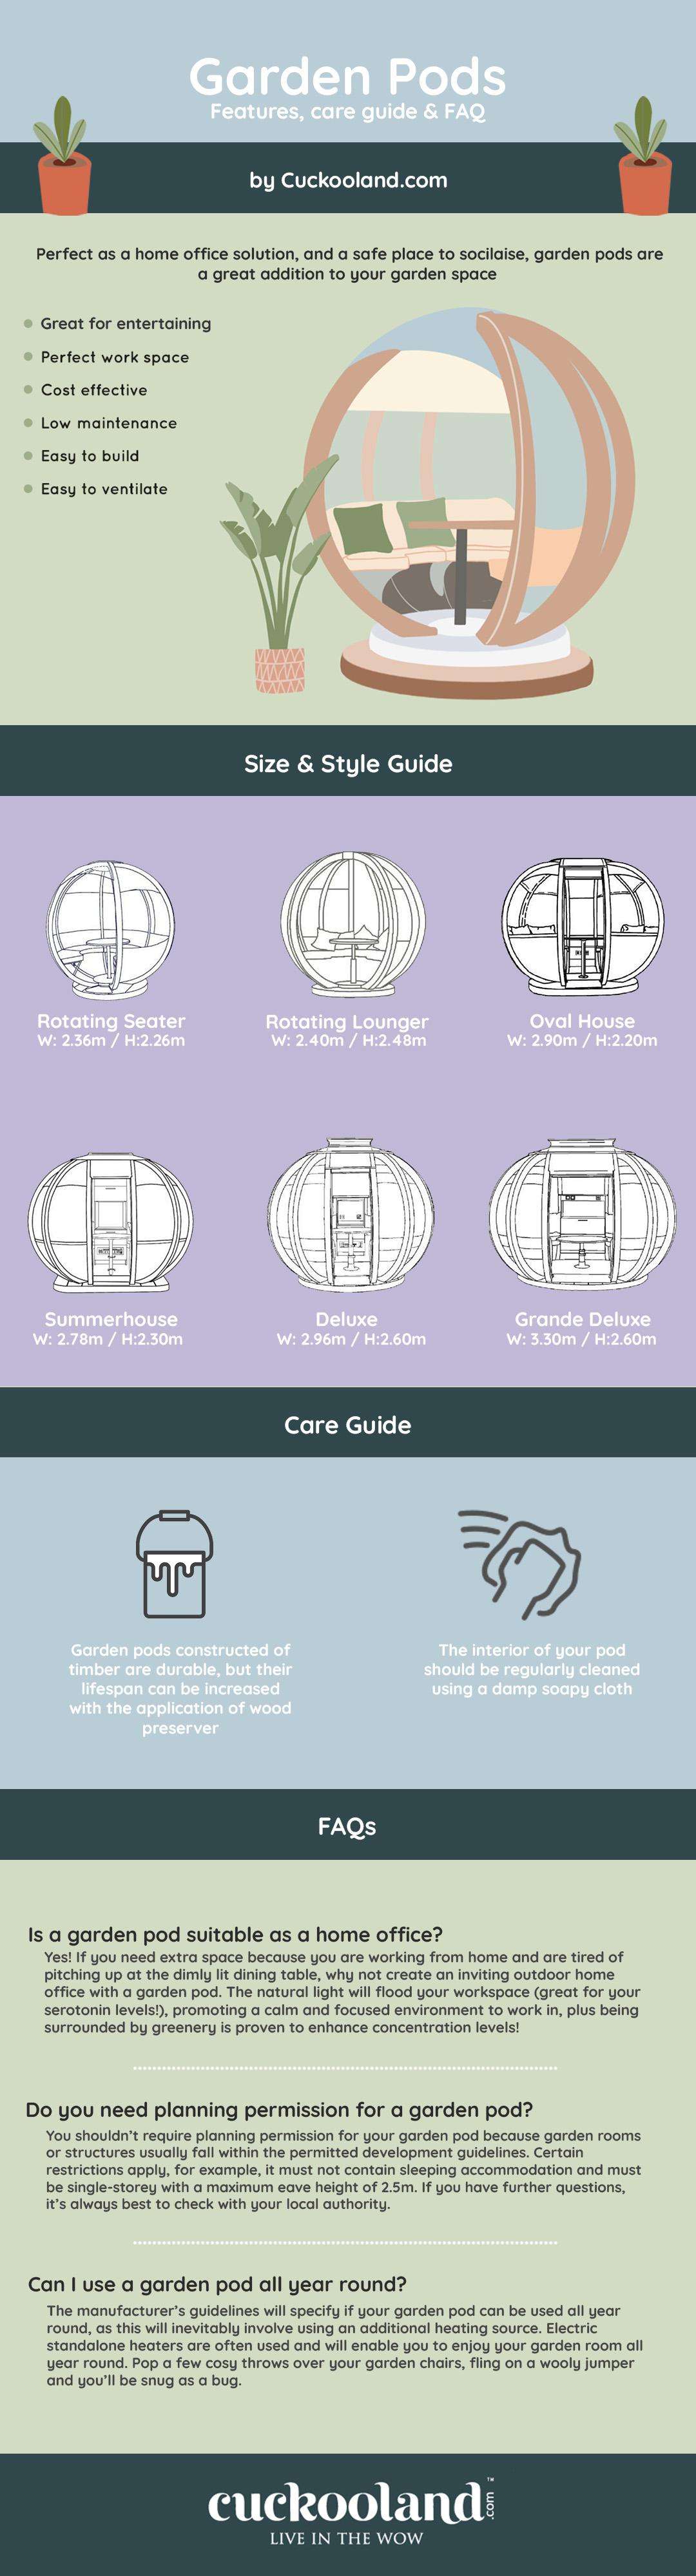 garden pod infographic